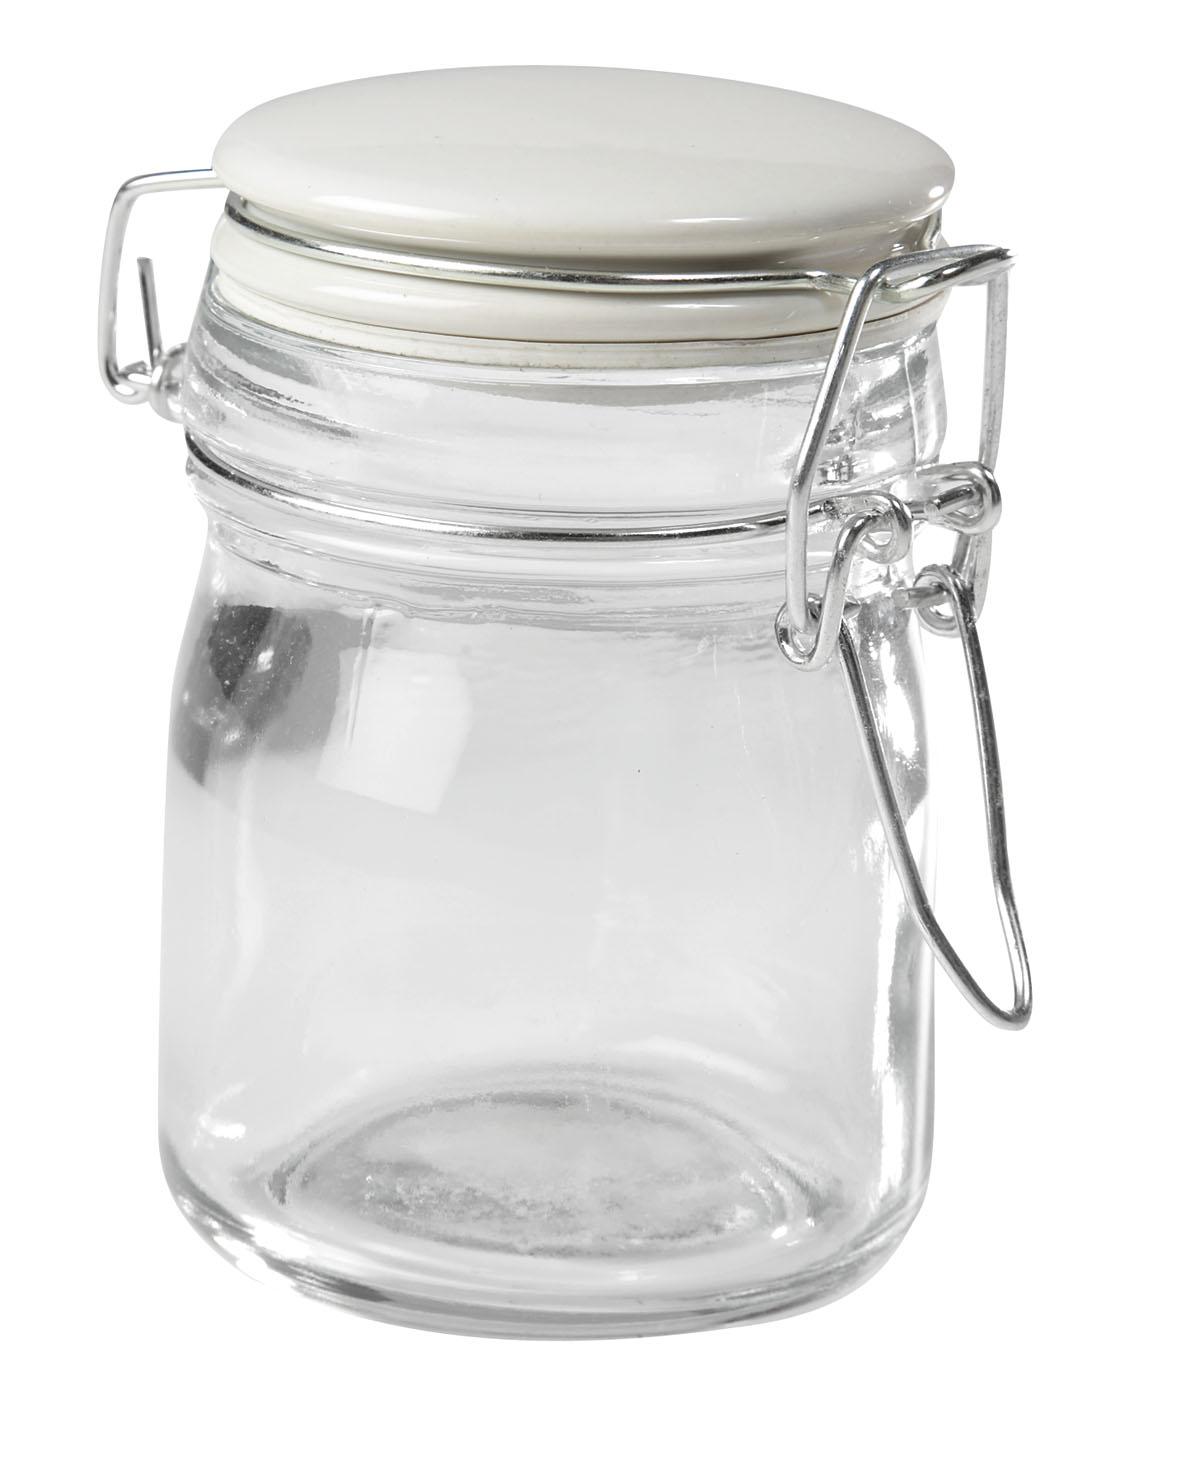 Strawbridge Storage Jar  €3.75  Product Code: Comp-1619